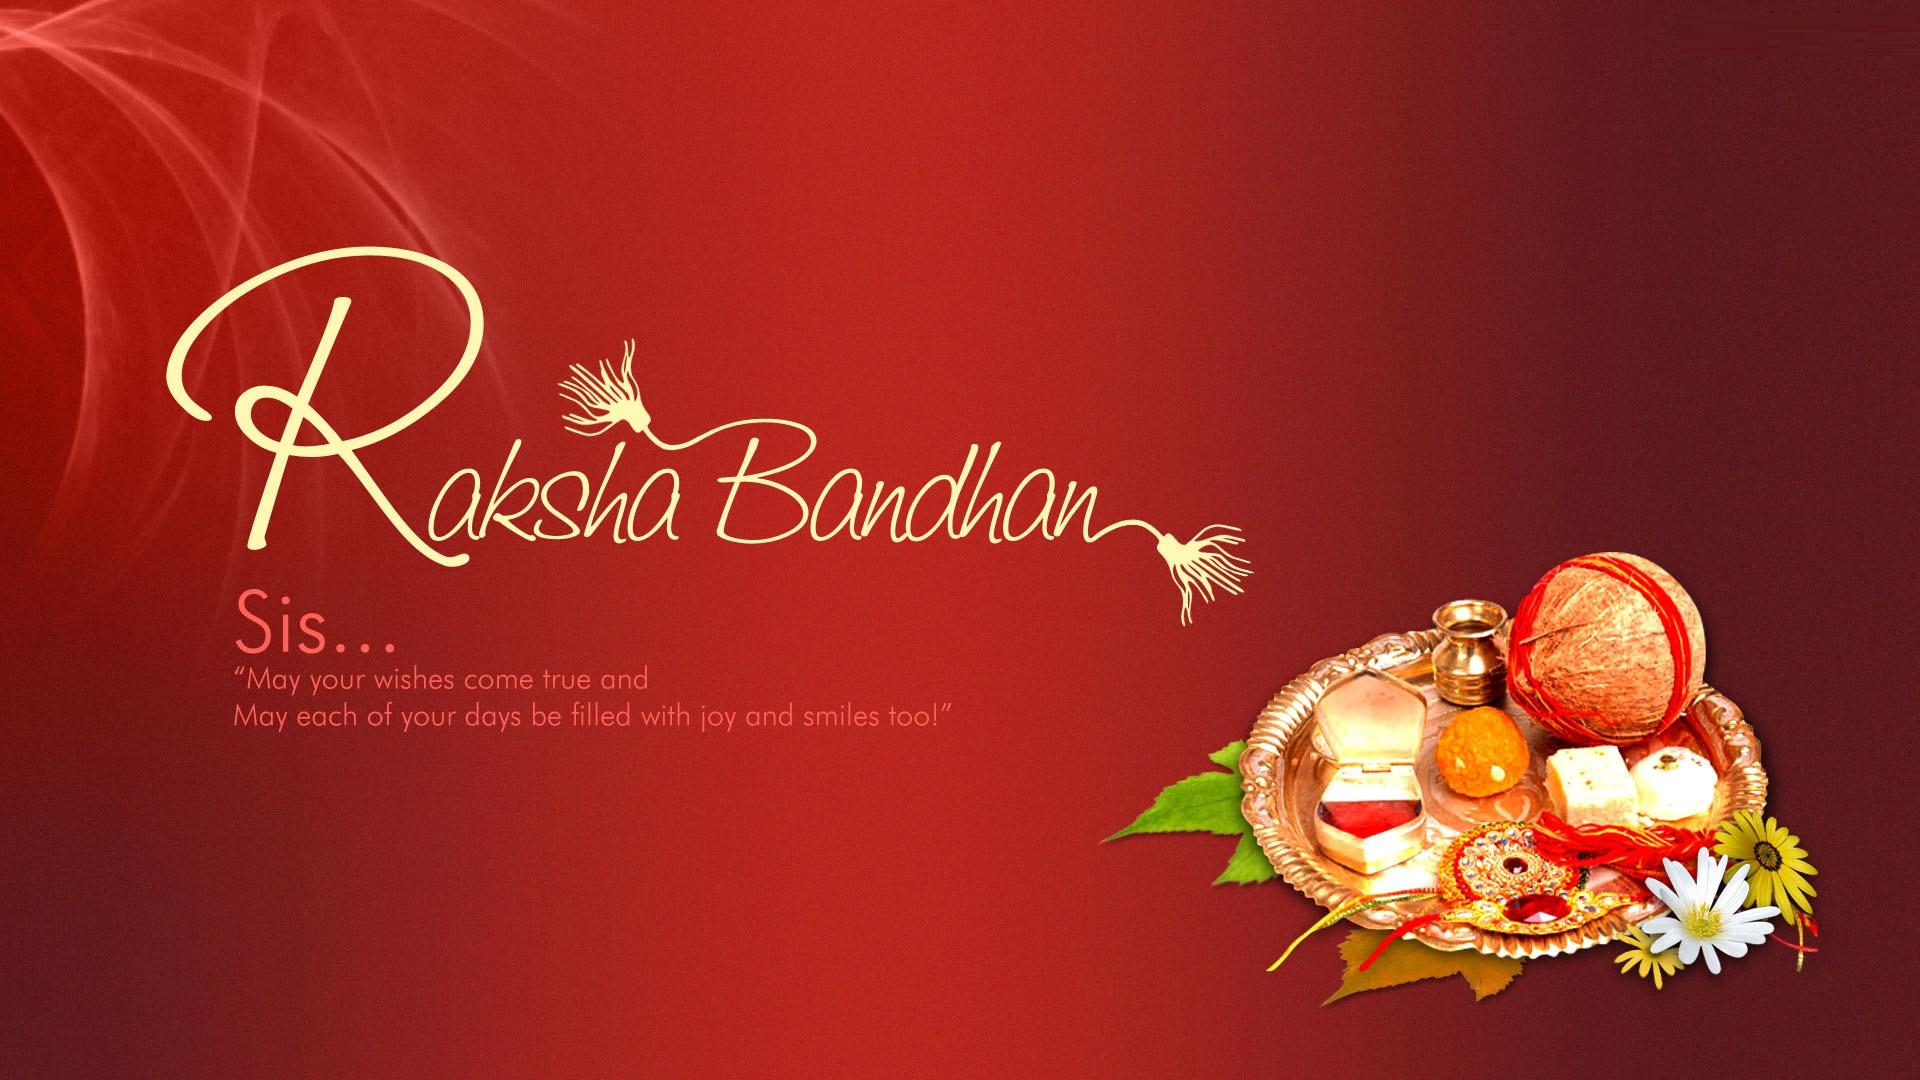 Raksha Bandhan HD Images, Wallpapers2